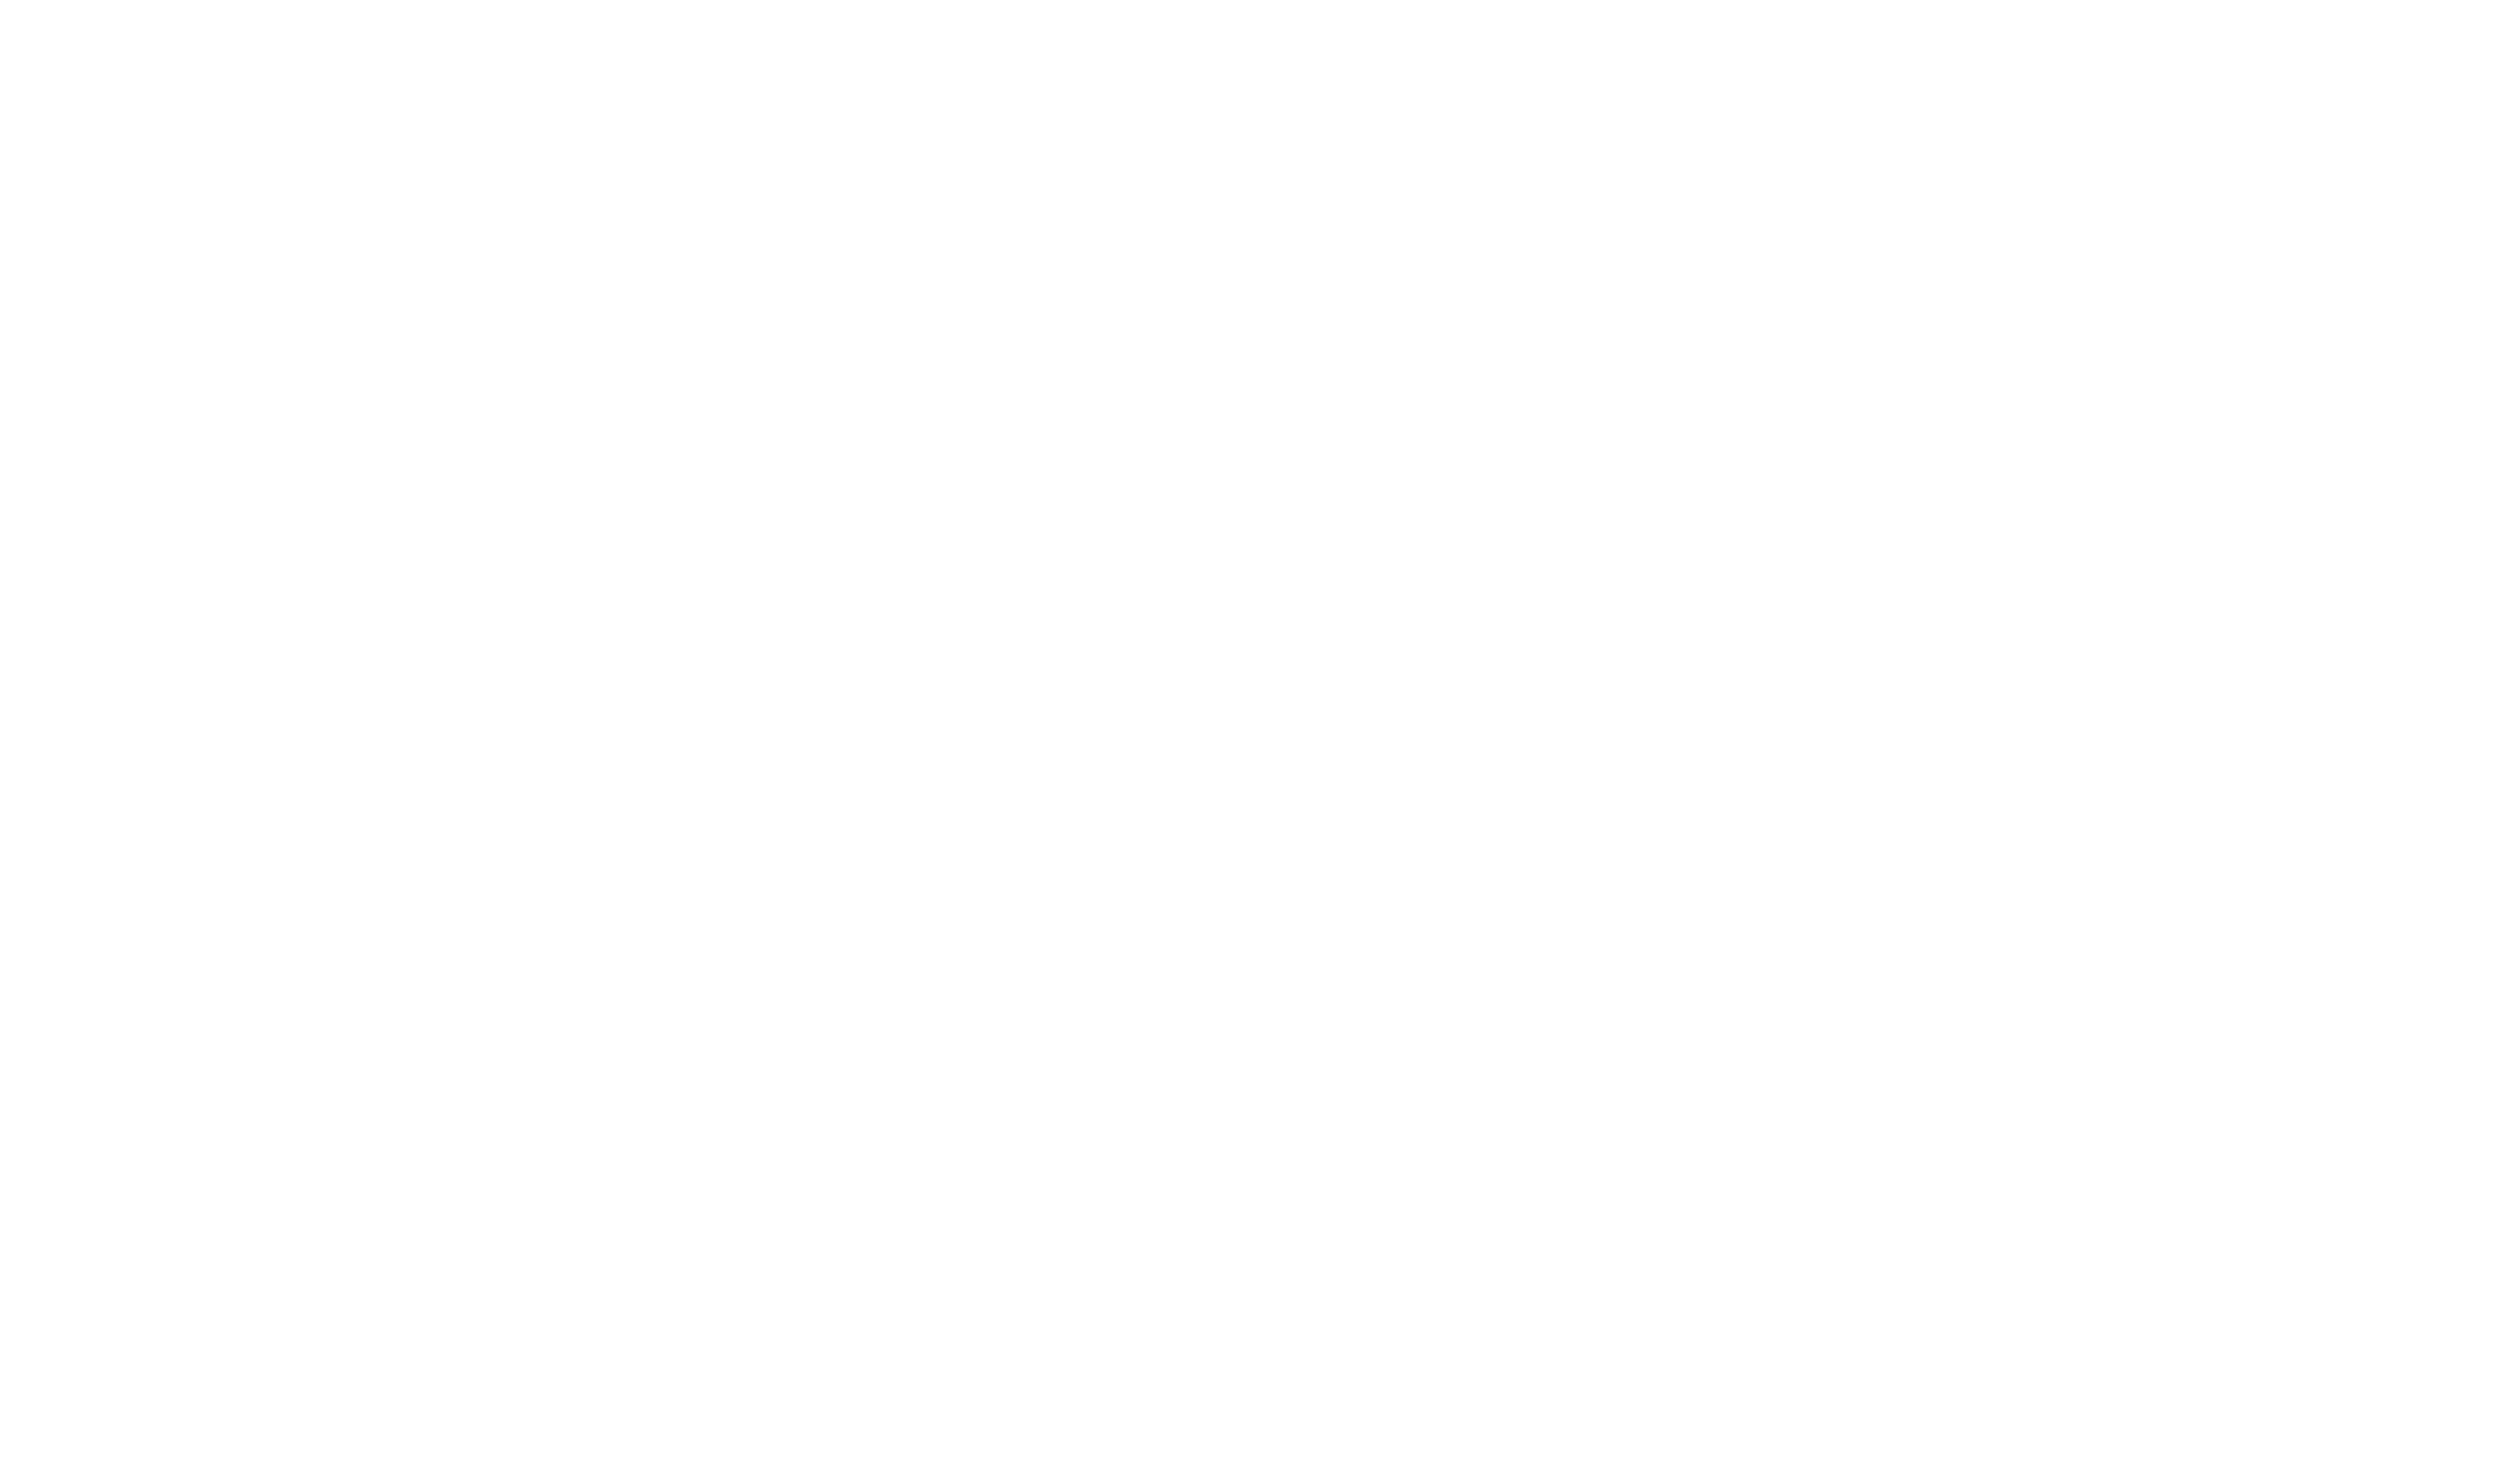 Novotel suite sblc 01 01 EAlbaret Agency